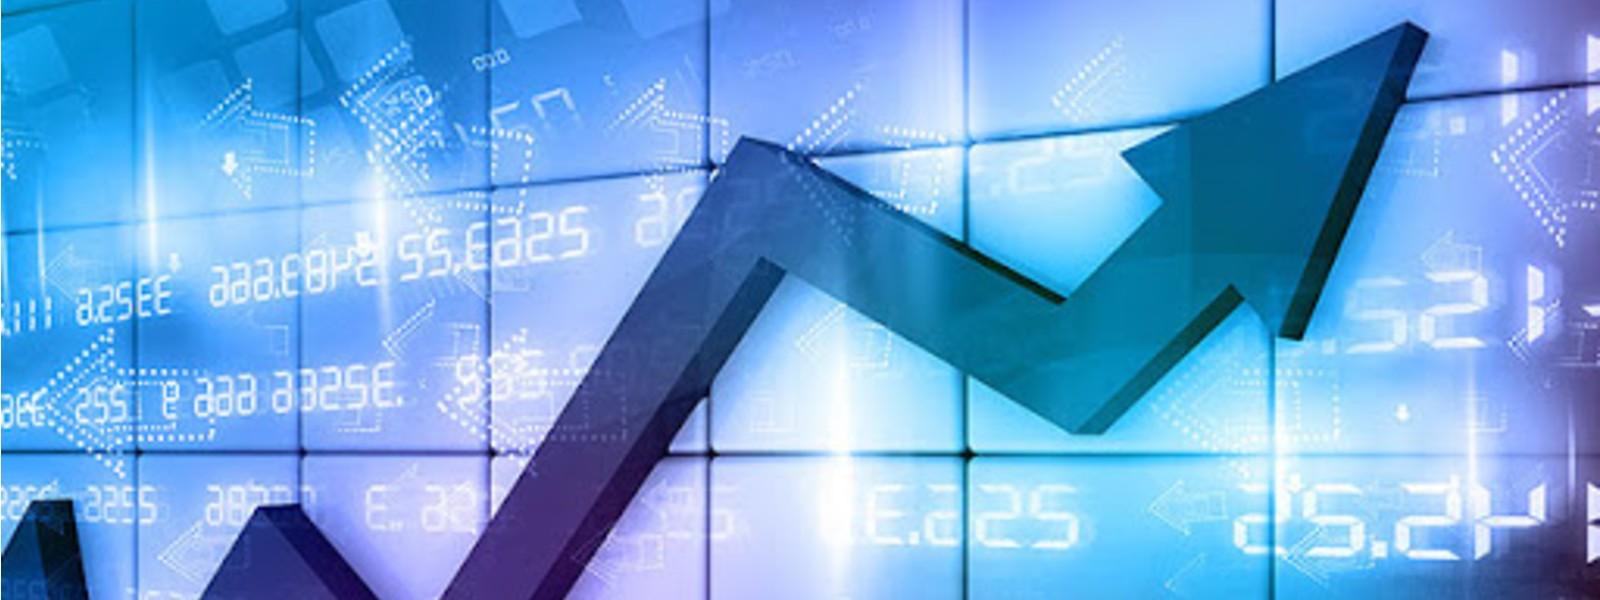 JVP WARNS OVER UNUSUAL STOCK GAINS